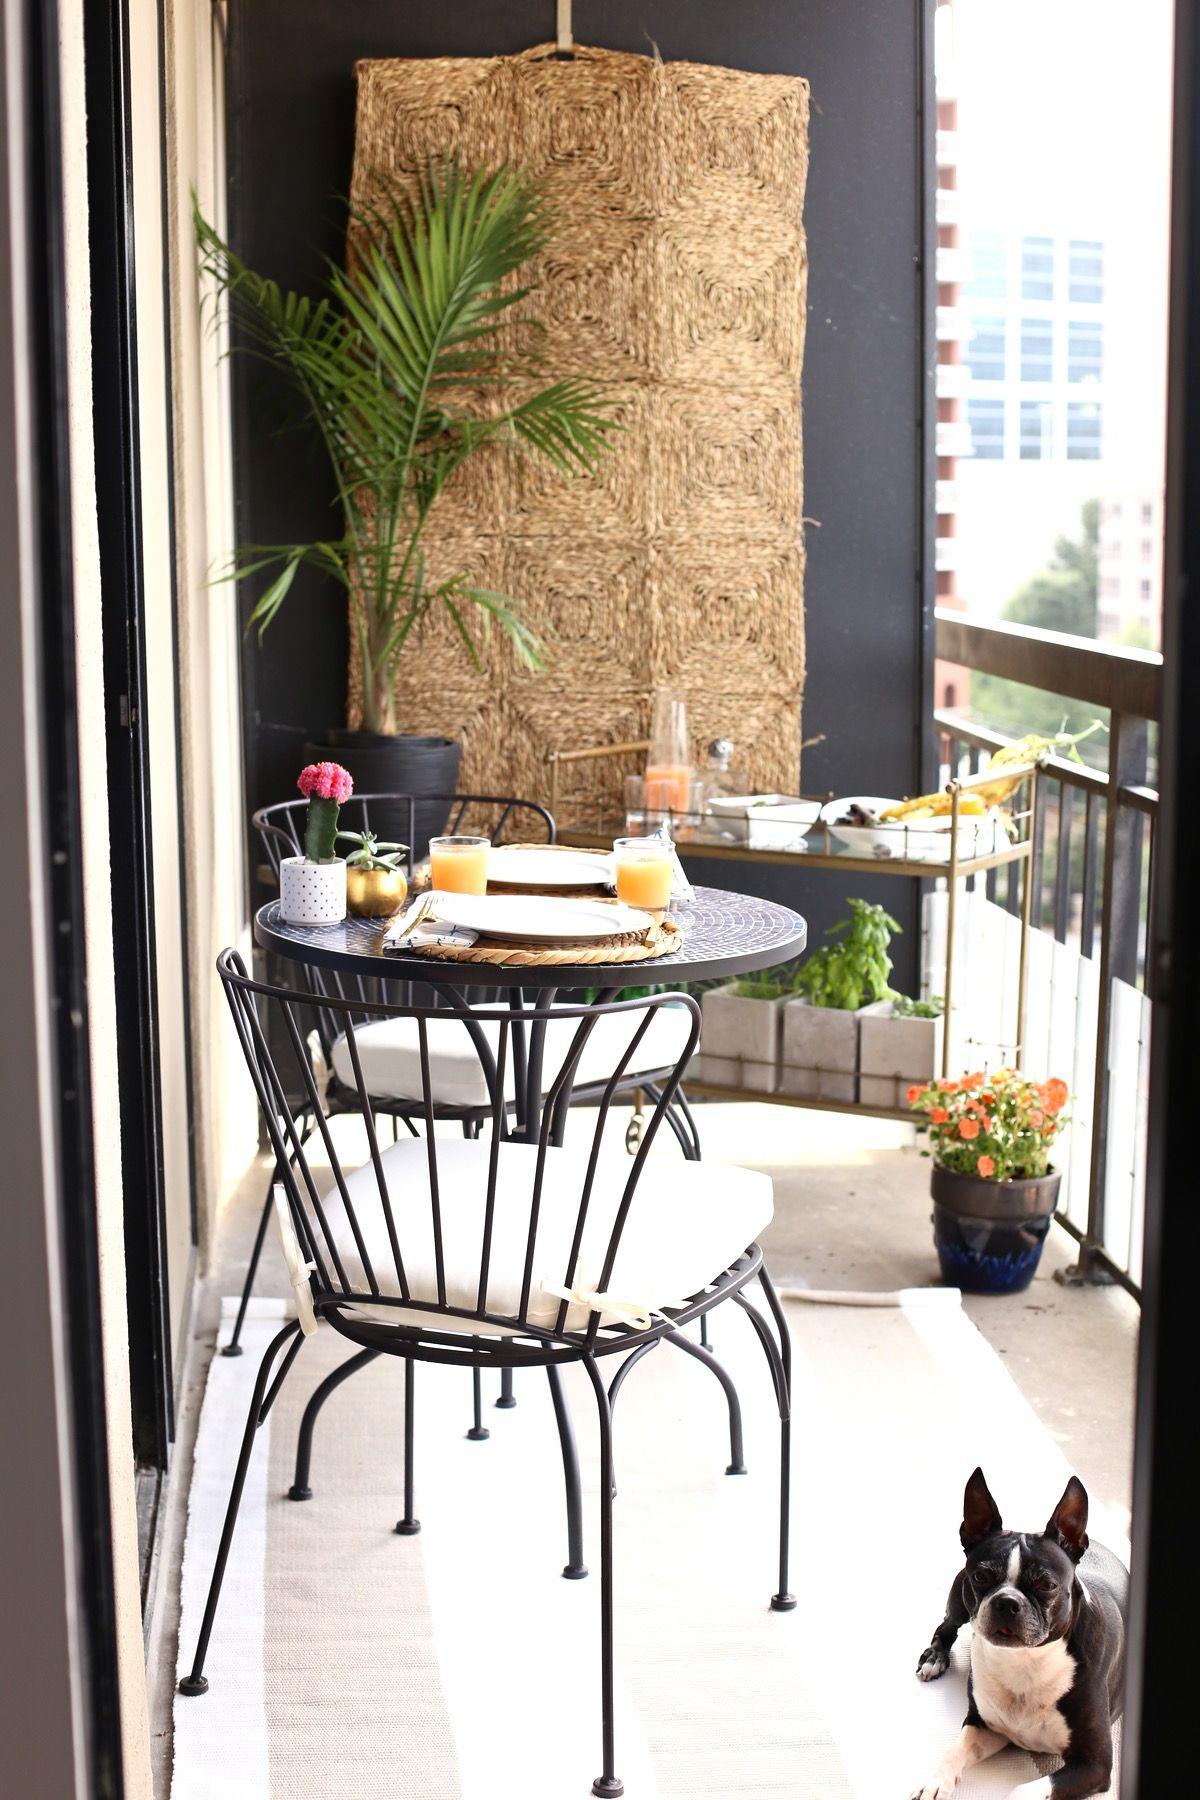 High Rise Patio Ideas Small Balcony Design Small Balcony Decor Small Apartment Balcony Ideas